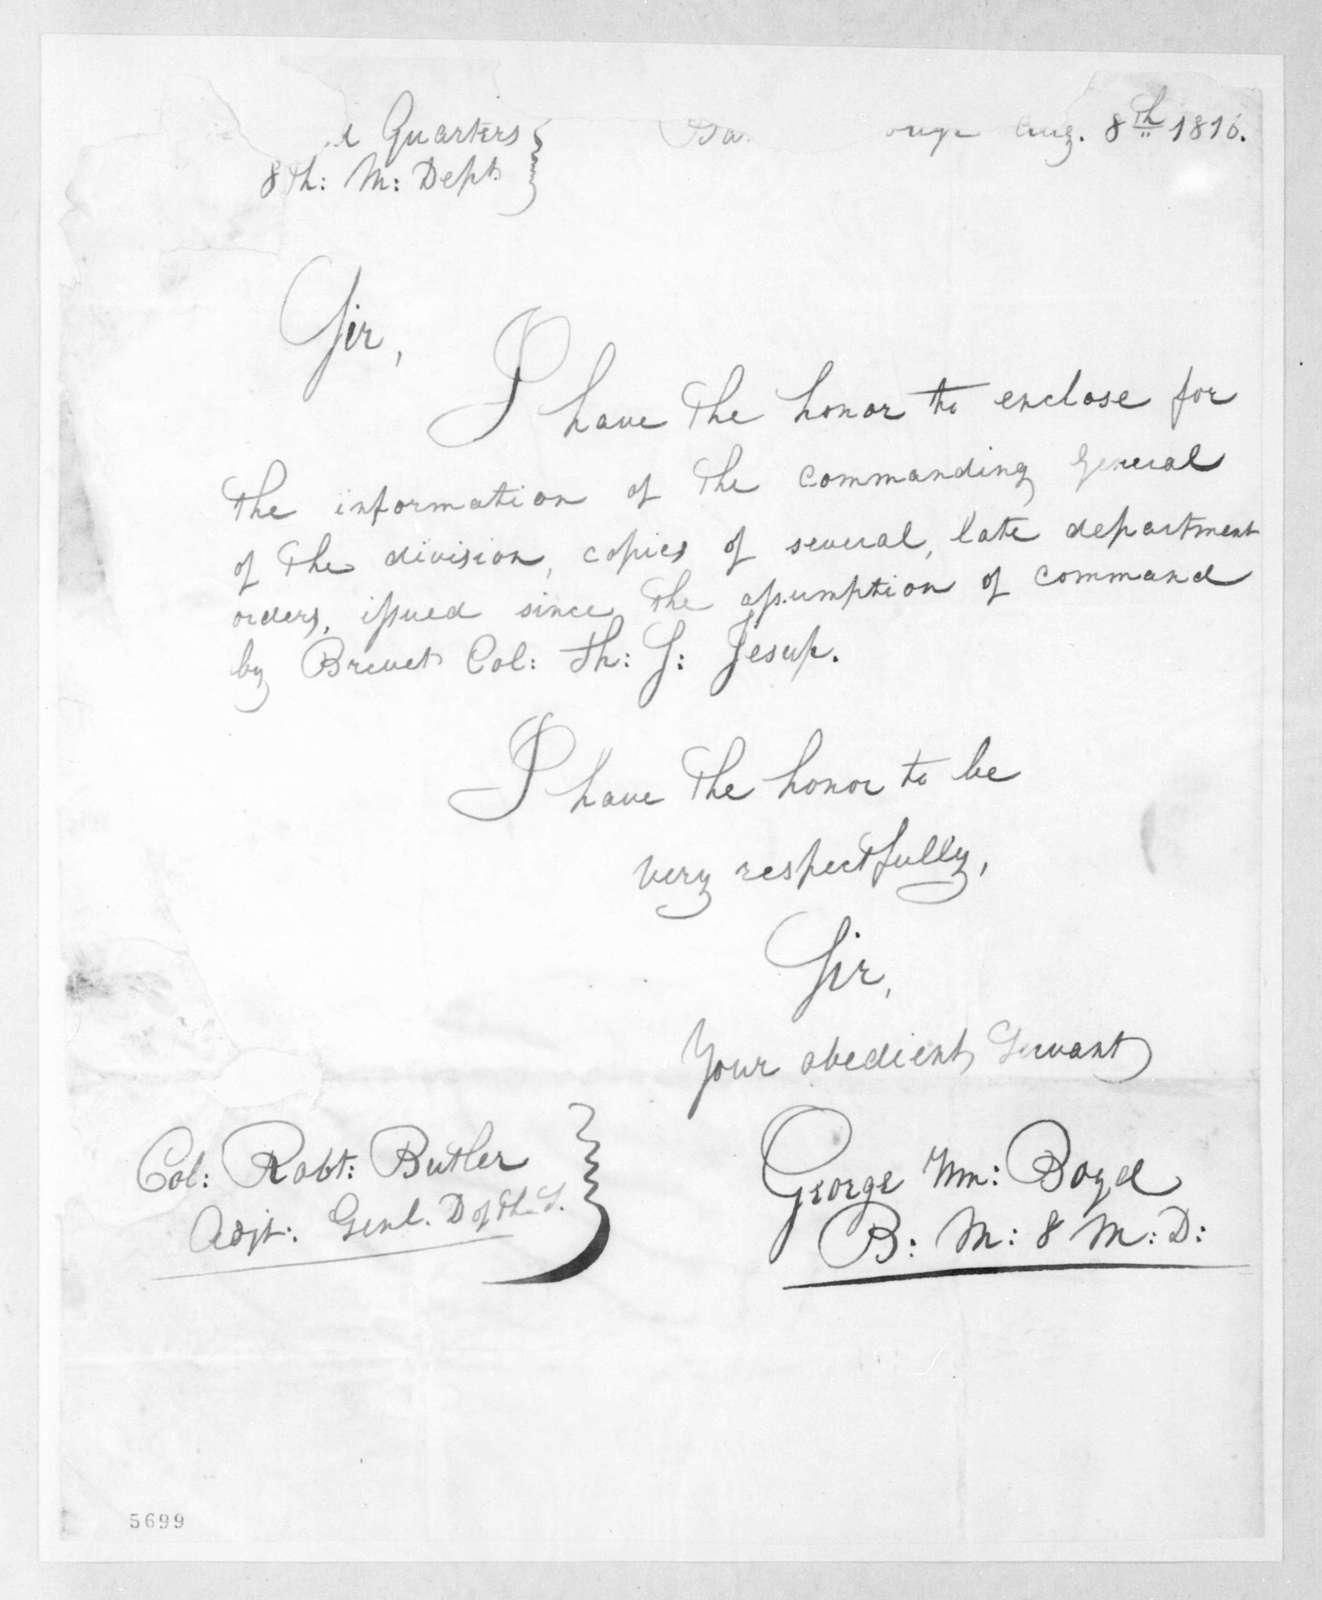 George William Boyd to Robert Butler, August 8, 1816